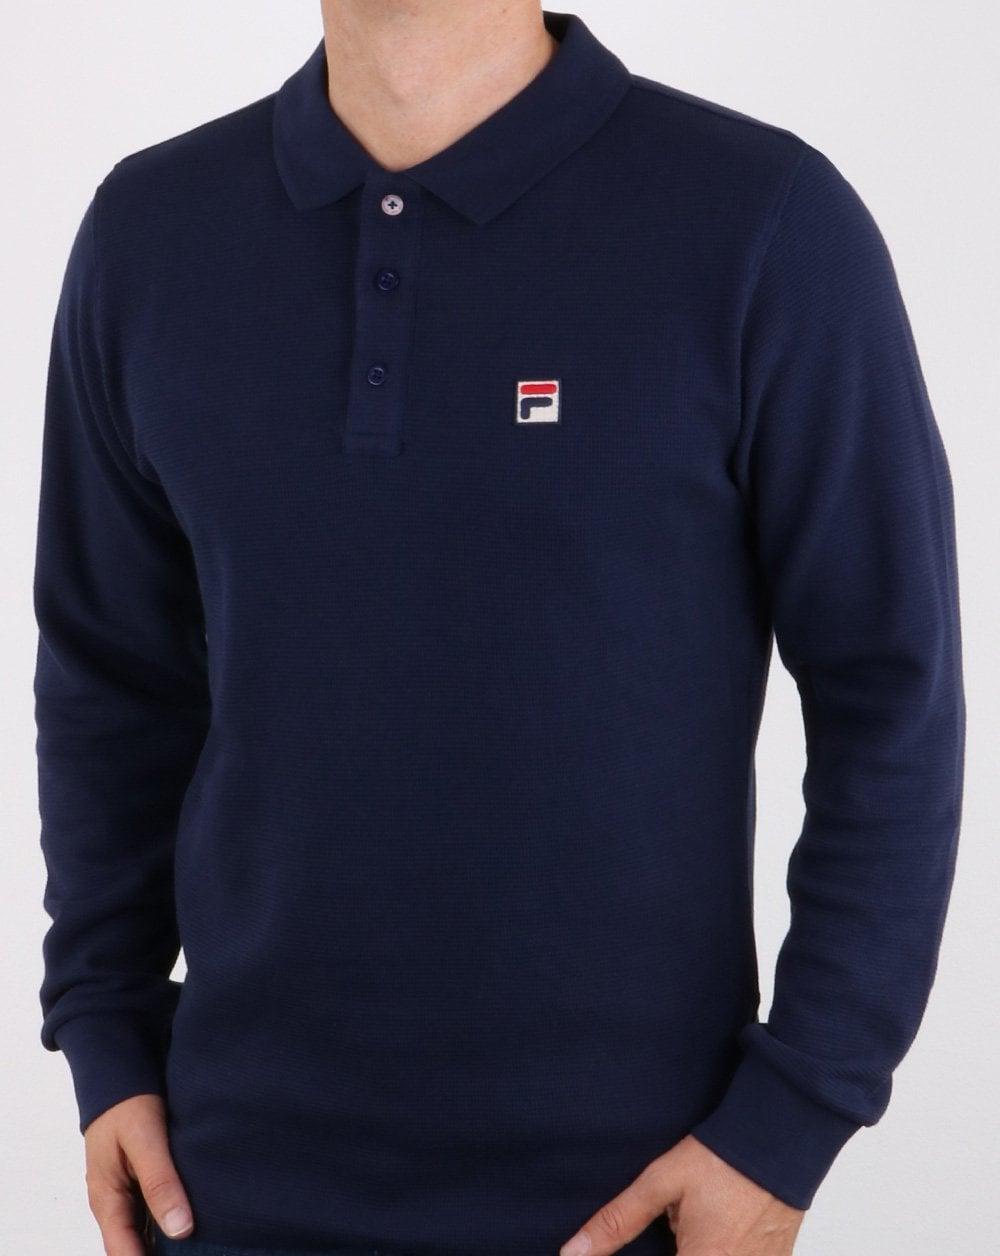 Fila Vintage Long Sleeve Polo Shirt Navy